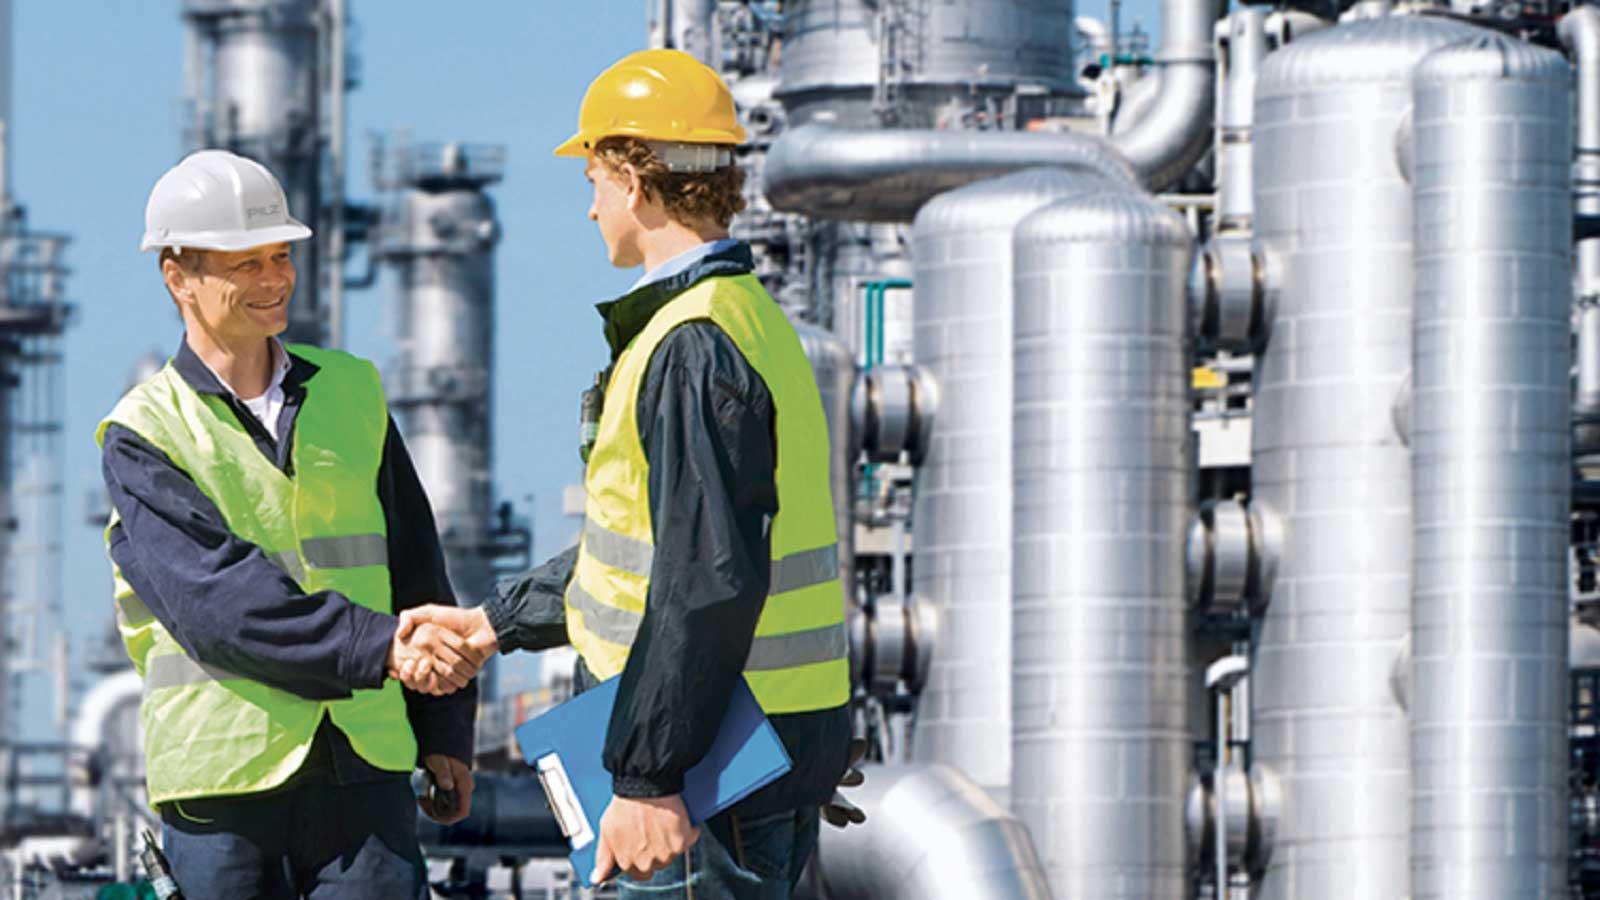 Process-Safety-Engineering-PG-Diploma-Certification-Training-Oil & Gas-Noida-Delhi-Online-Mumbai-Dubai-South-Africa-Sudan